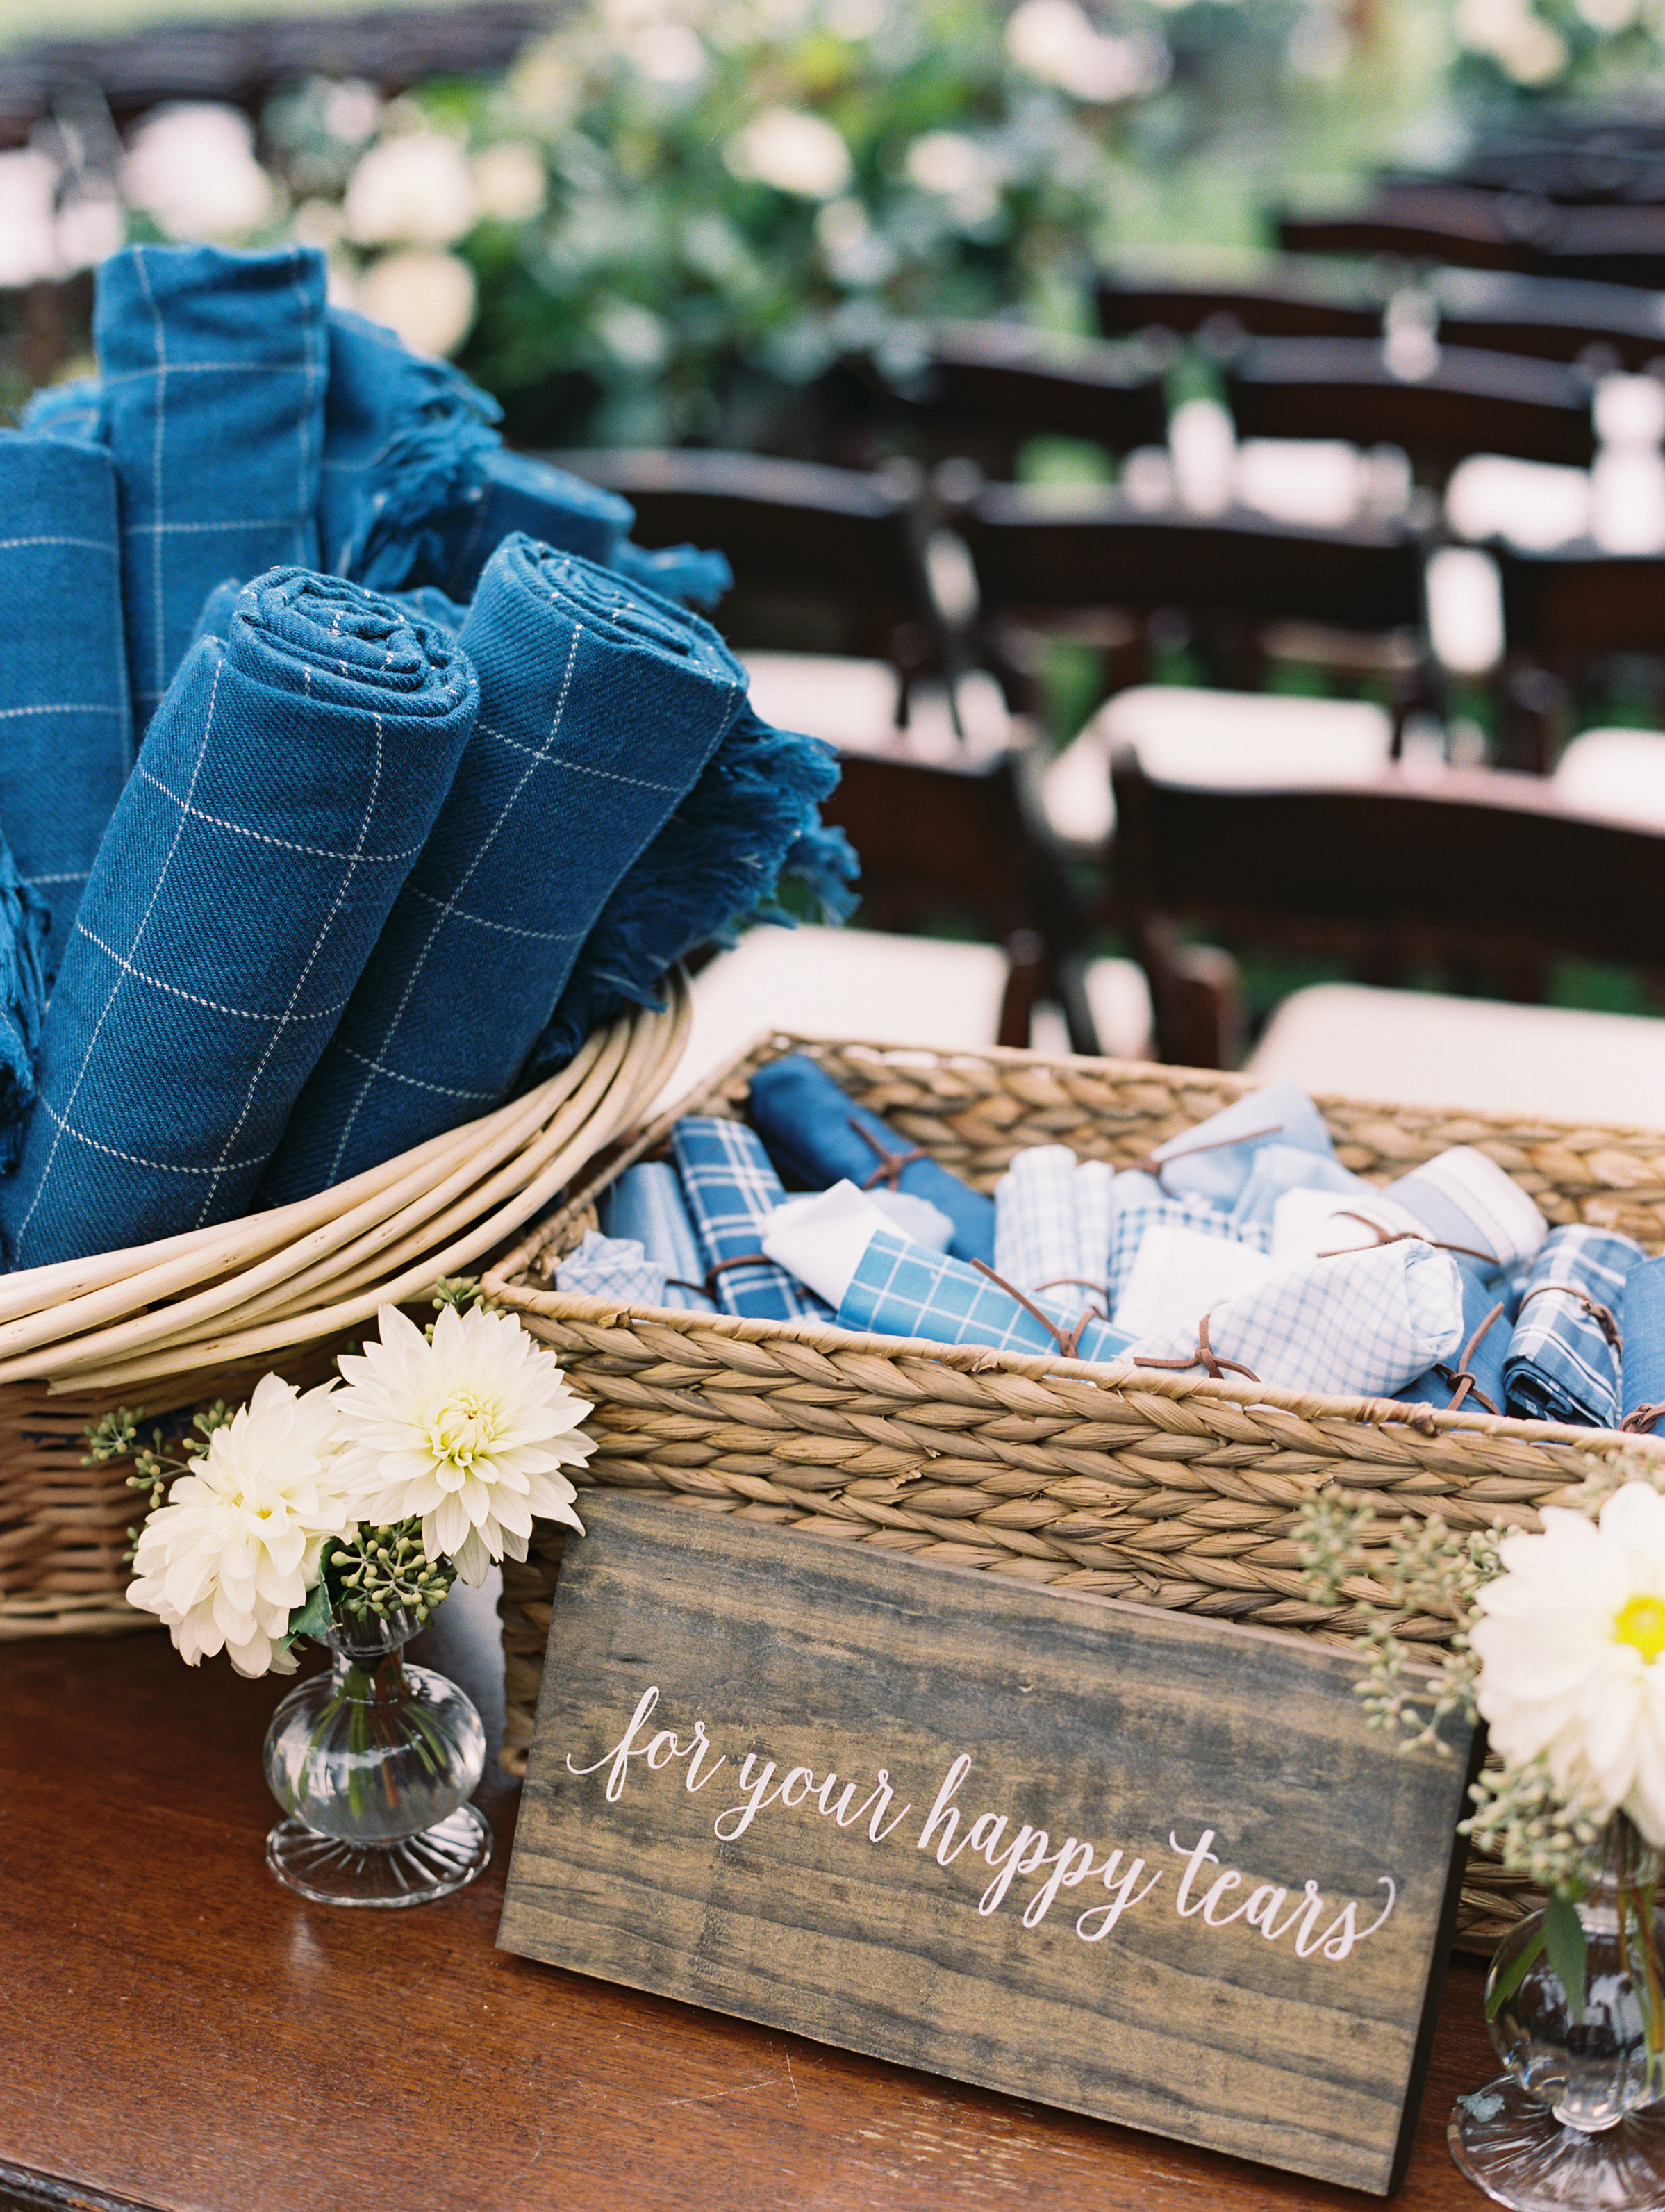 kendall nick wedding blankets hankies